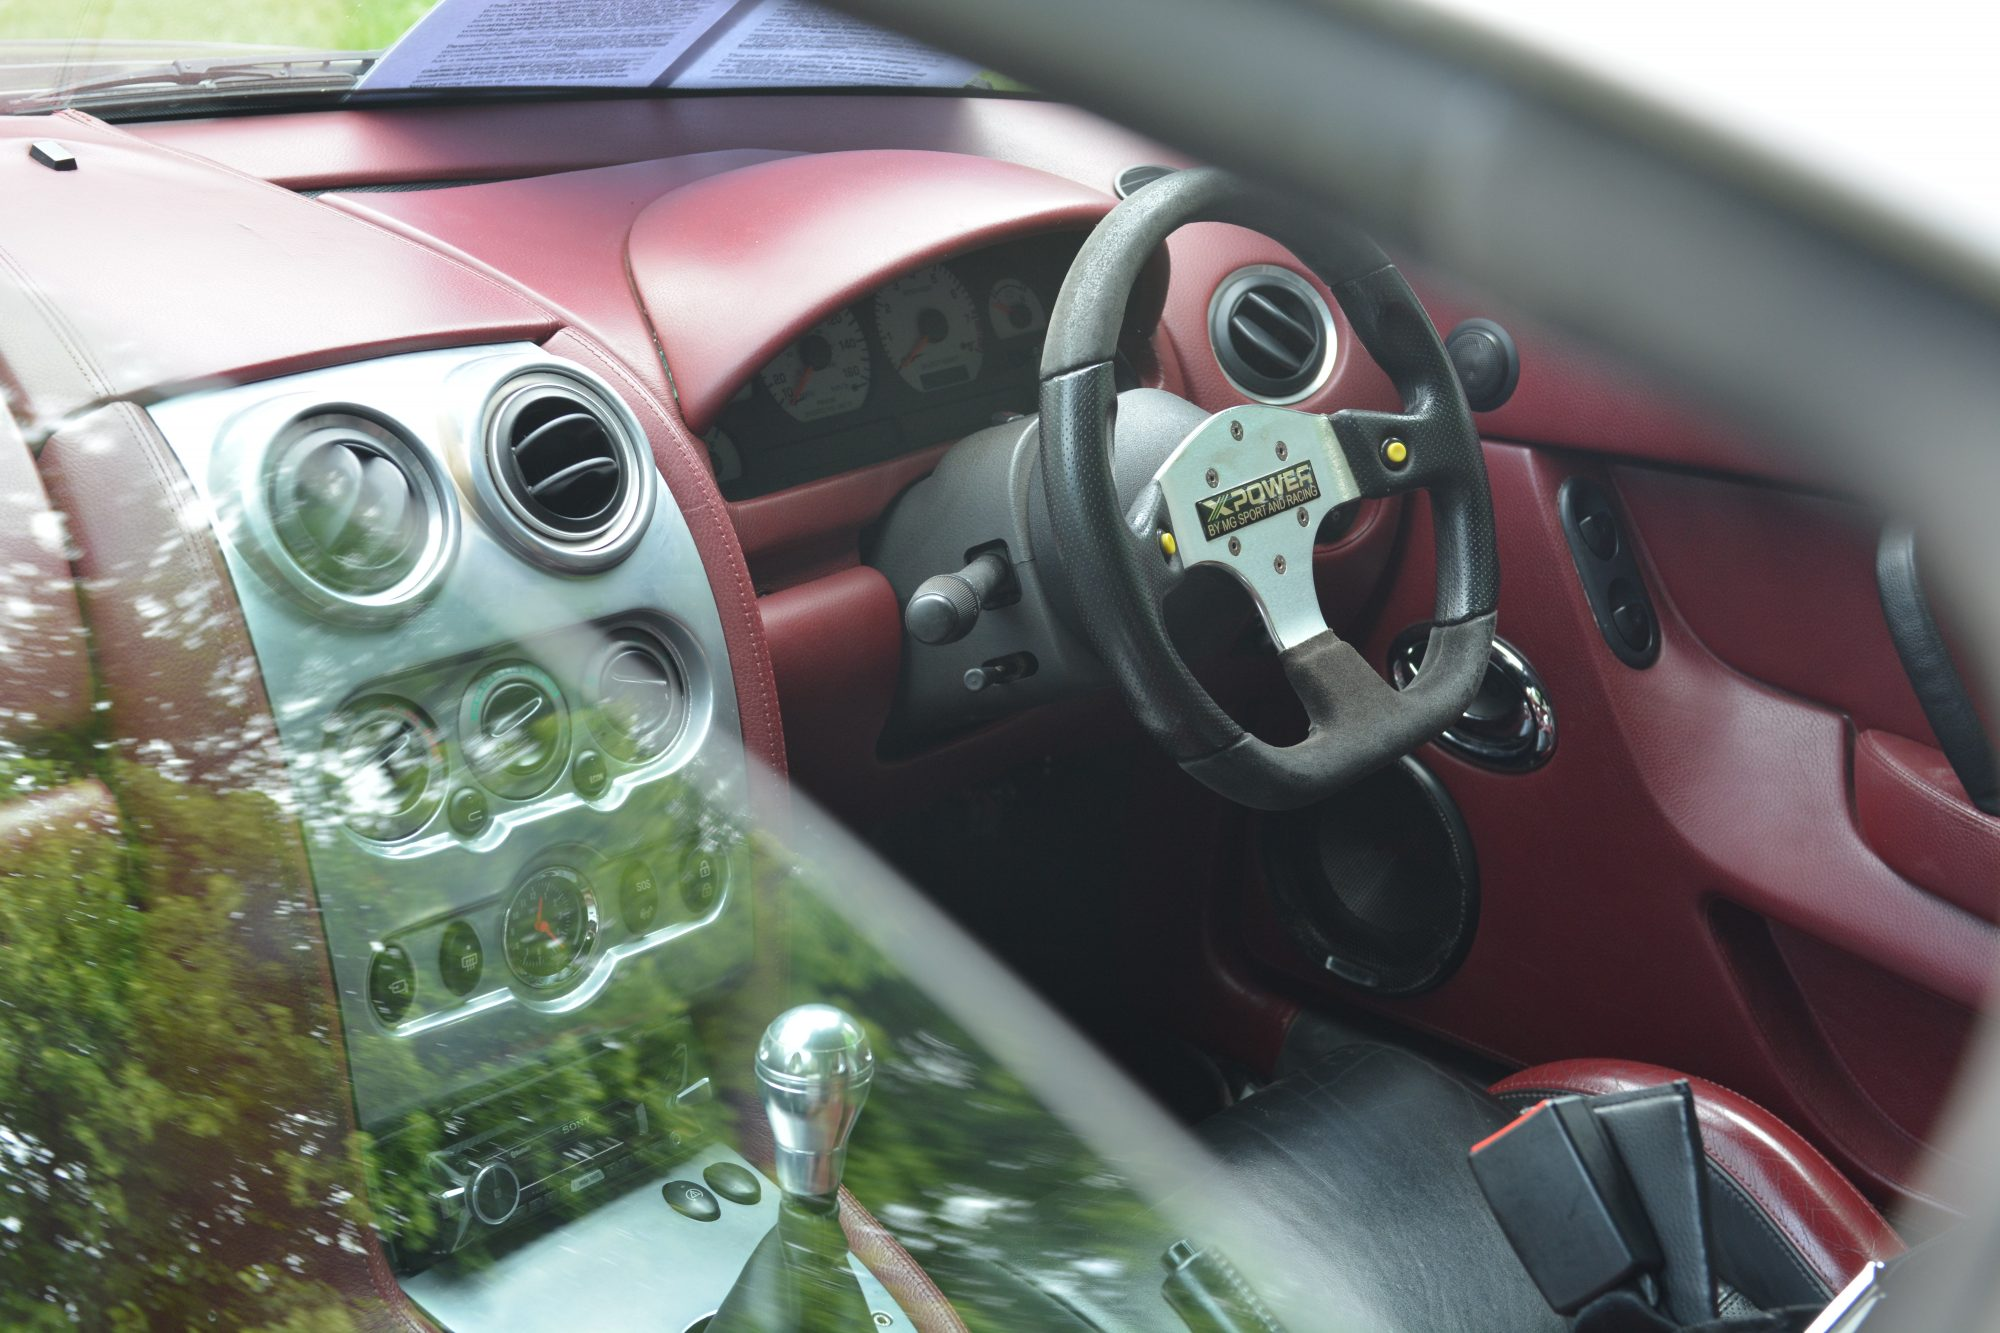 Motorsport, Motorsport at the Palace, Crystal Palace, London car show, classic car, show, classic motorsport, MG SV interior